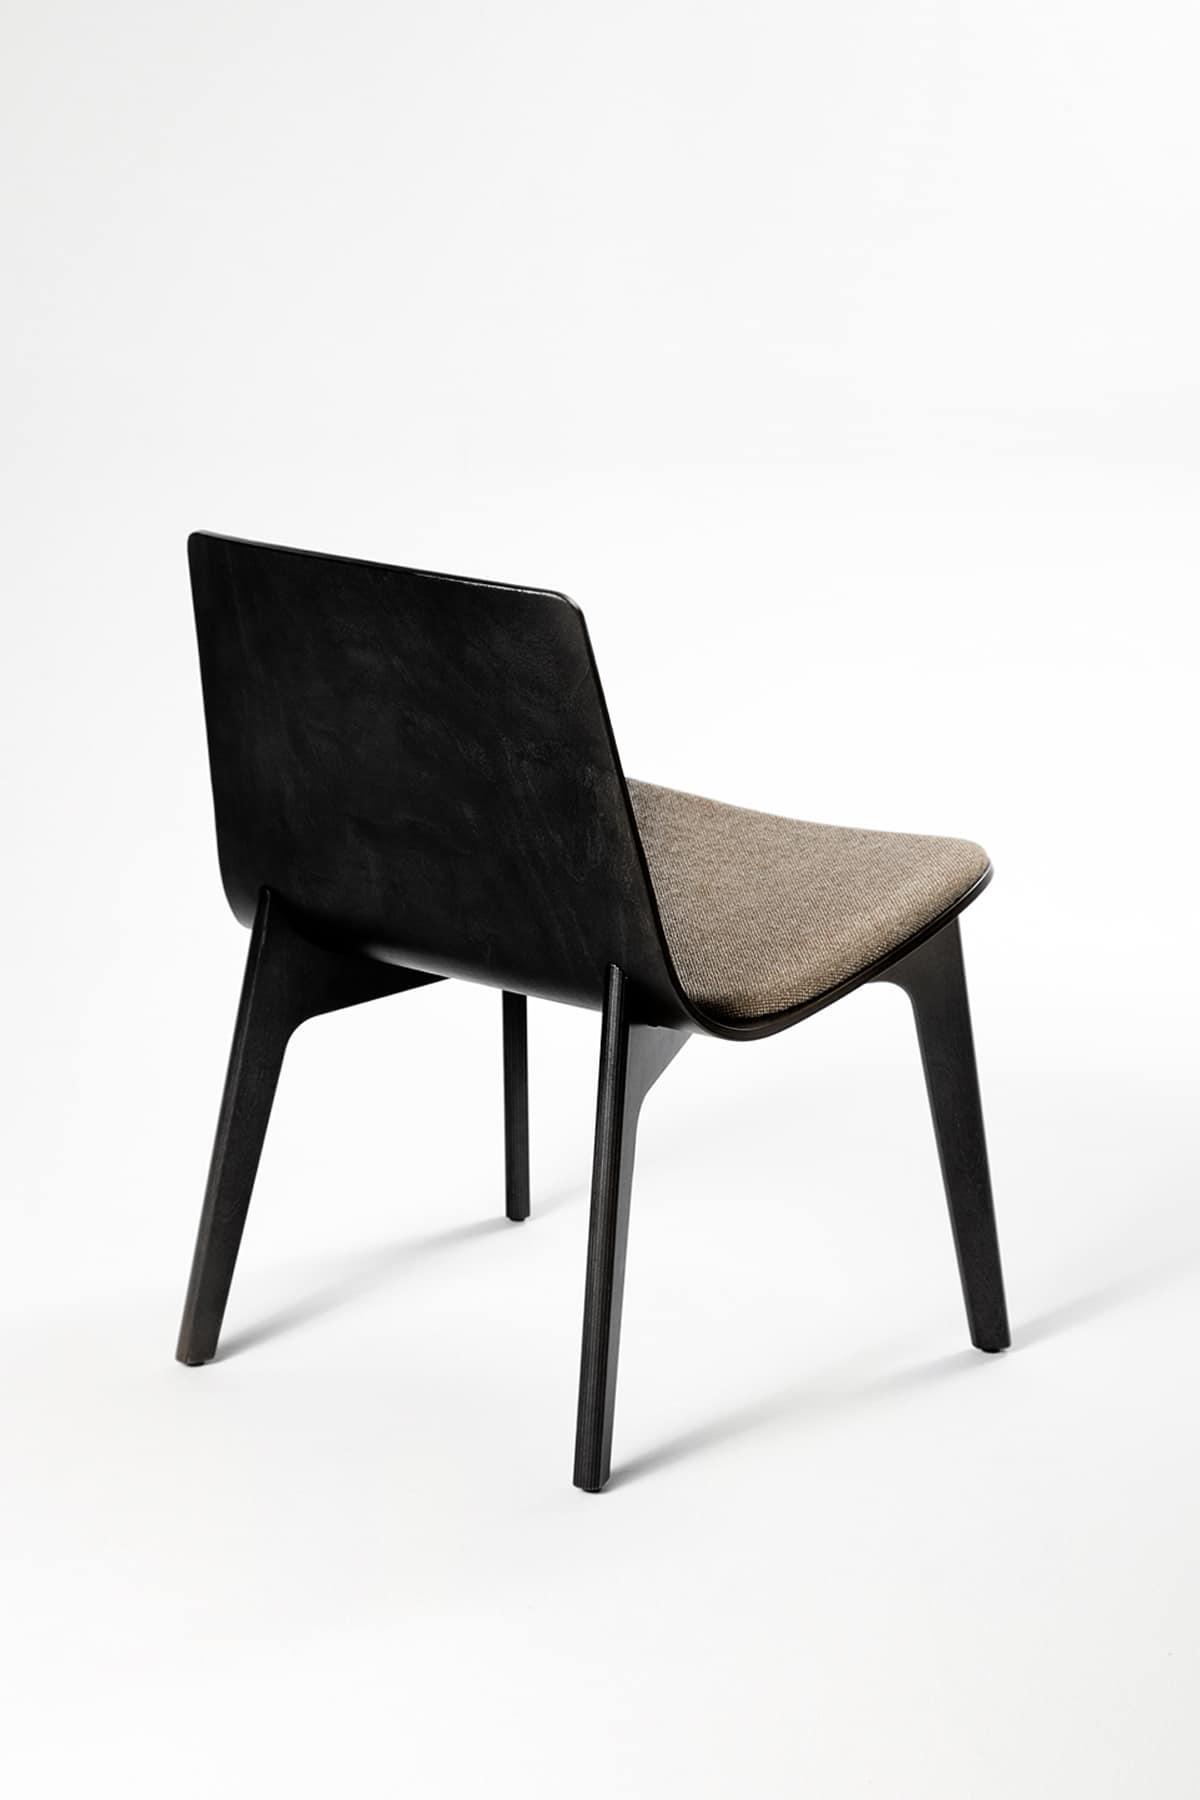 Lottus Wood fauteuil